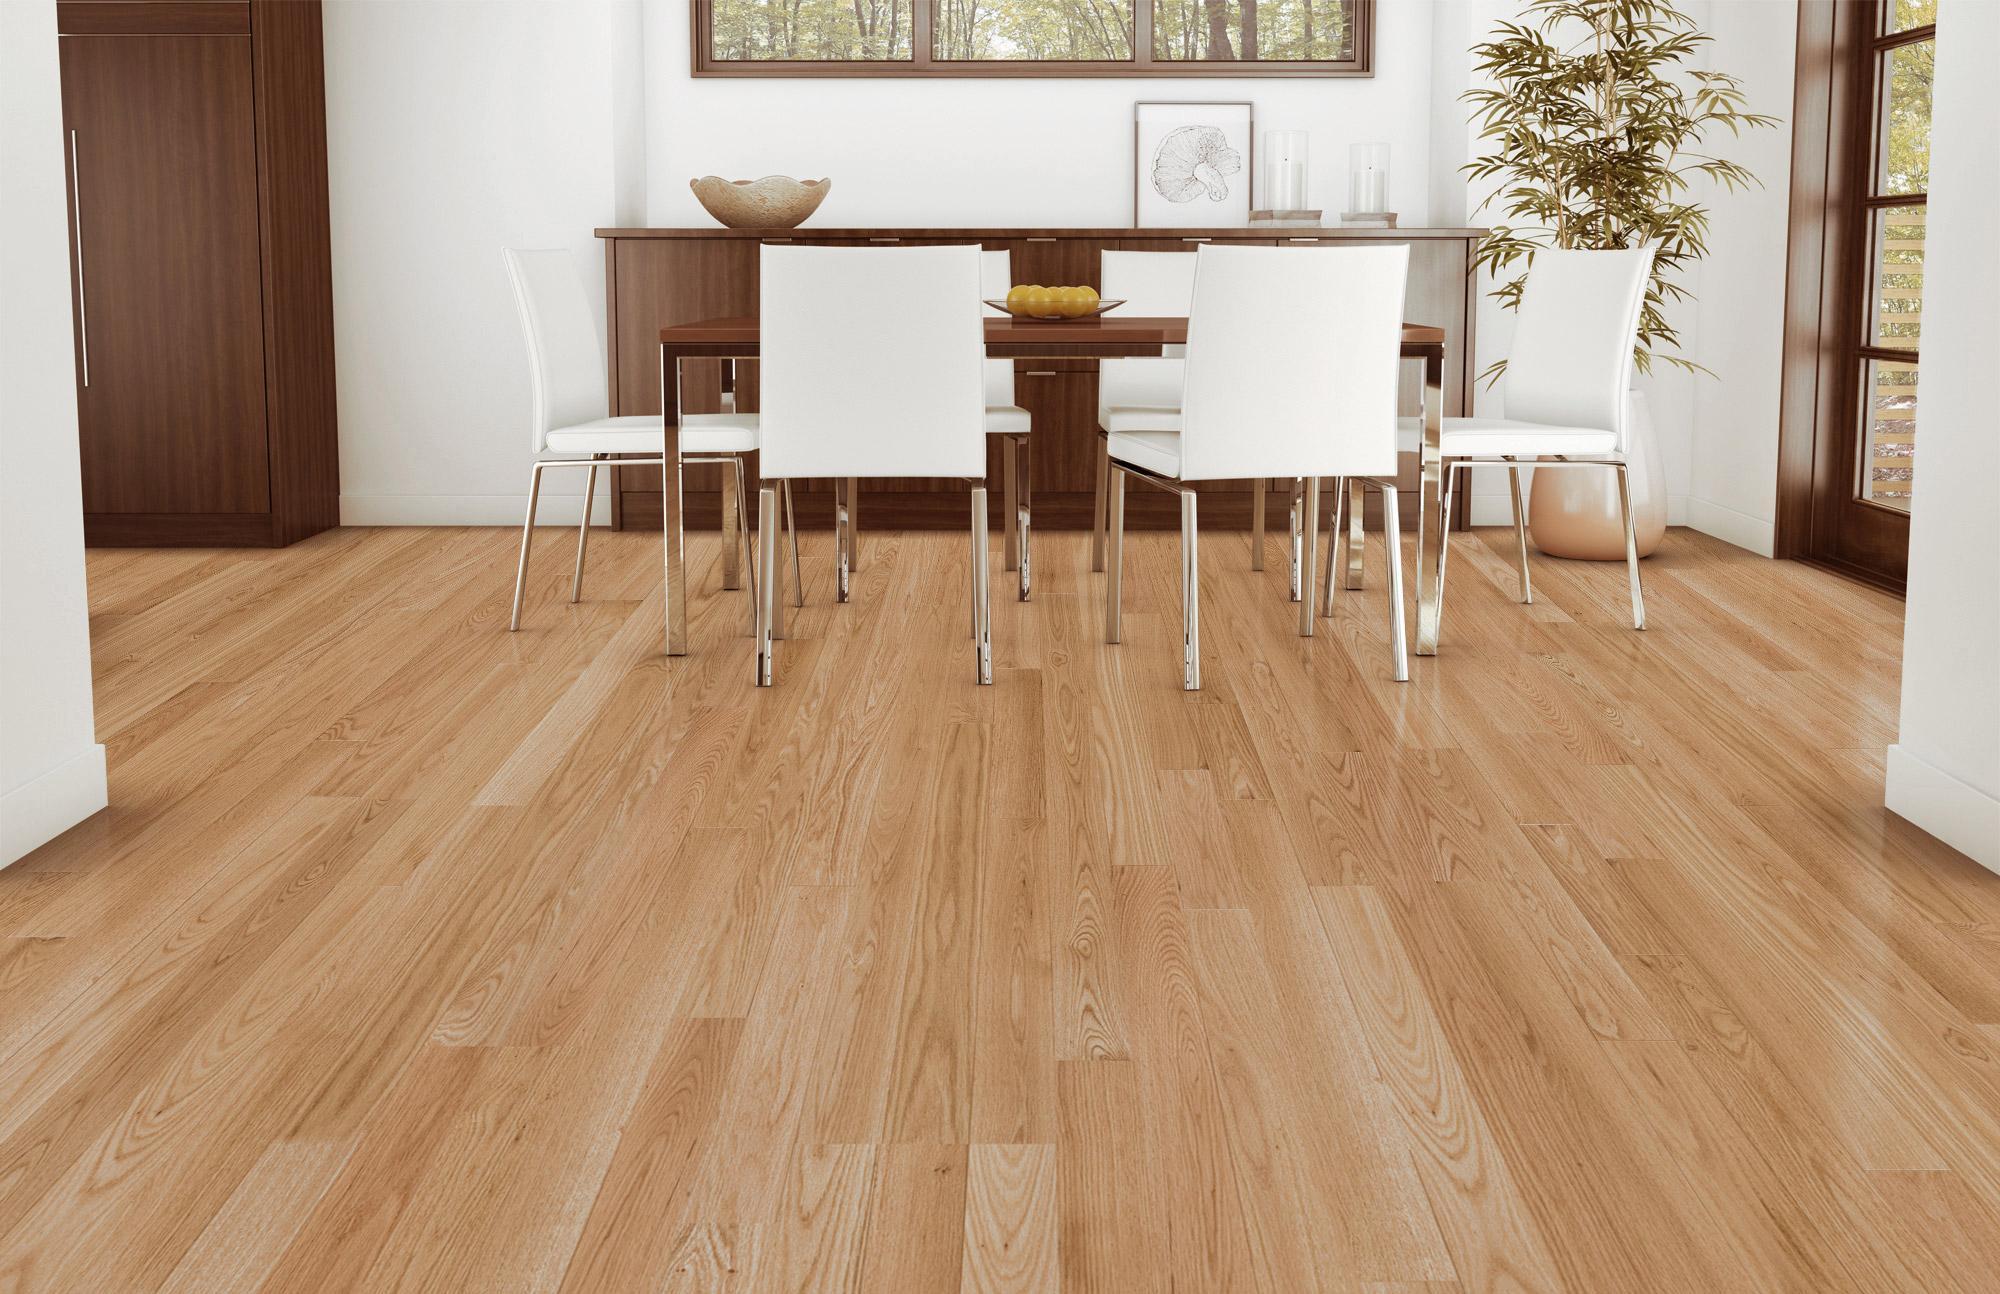 5 red oak hardwood flooring of mullican ridgecrest red oak natural 1 2 thick 5 wide engineered inside mullican ridgecrest red oak natural 1 2 thick 5 wide engineered hardwood flooring